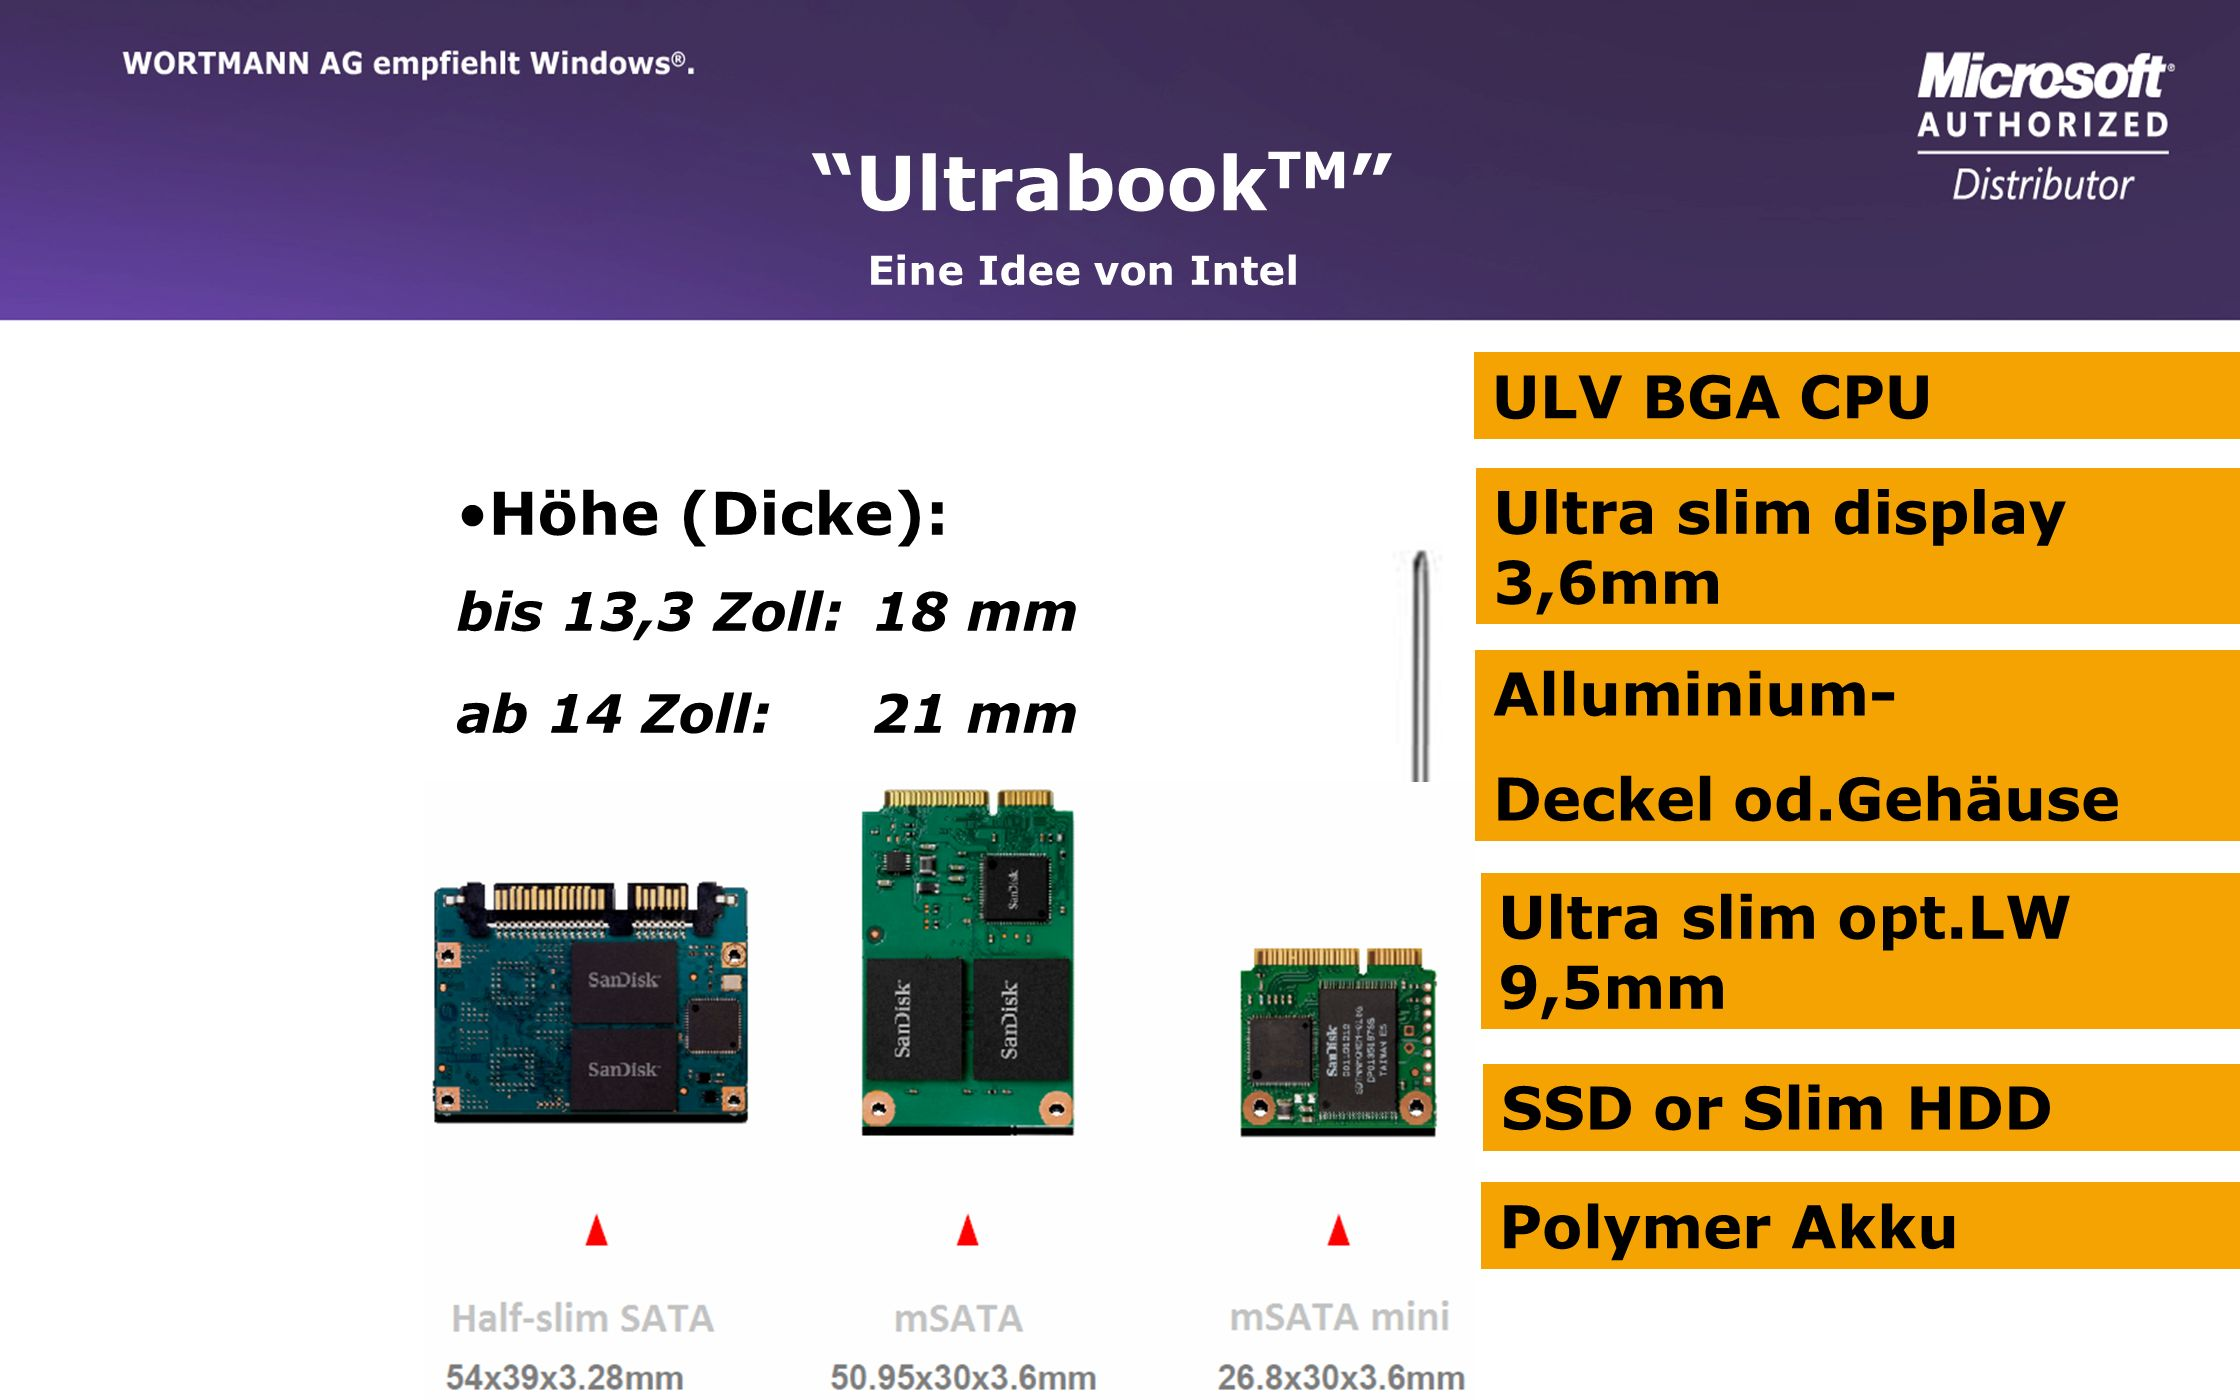 www.wortmann.de Eine Idee von Intel Ultrabook TM ULV BGA CPU Ultra slim display 3,6mm Alluminium- Deckel od.Gehäuse Ultra slim opt.LW 9,5mm SSD or Sli